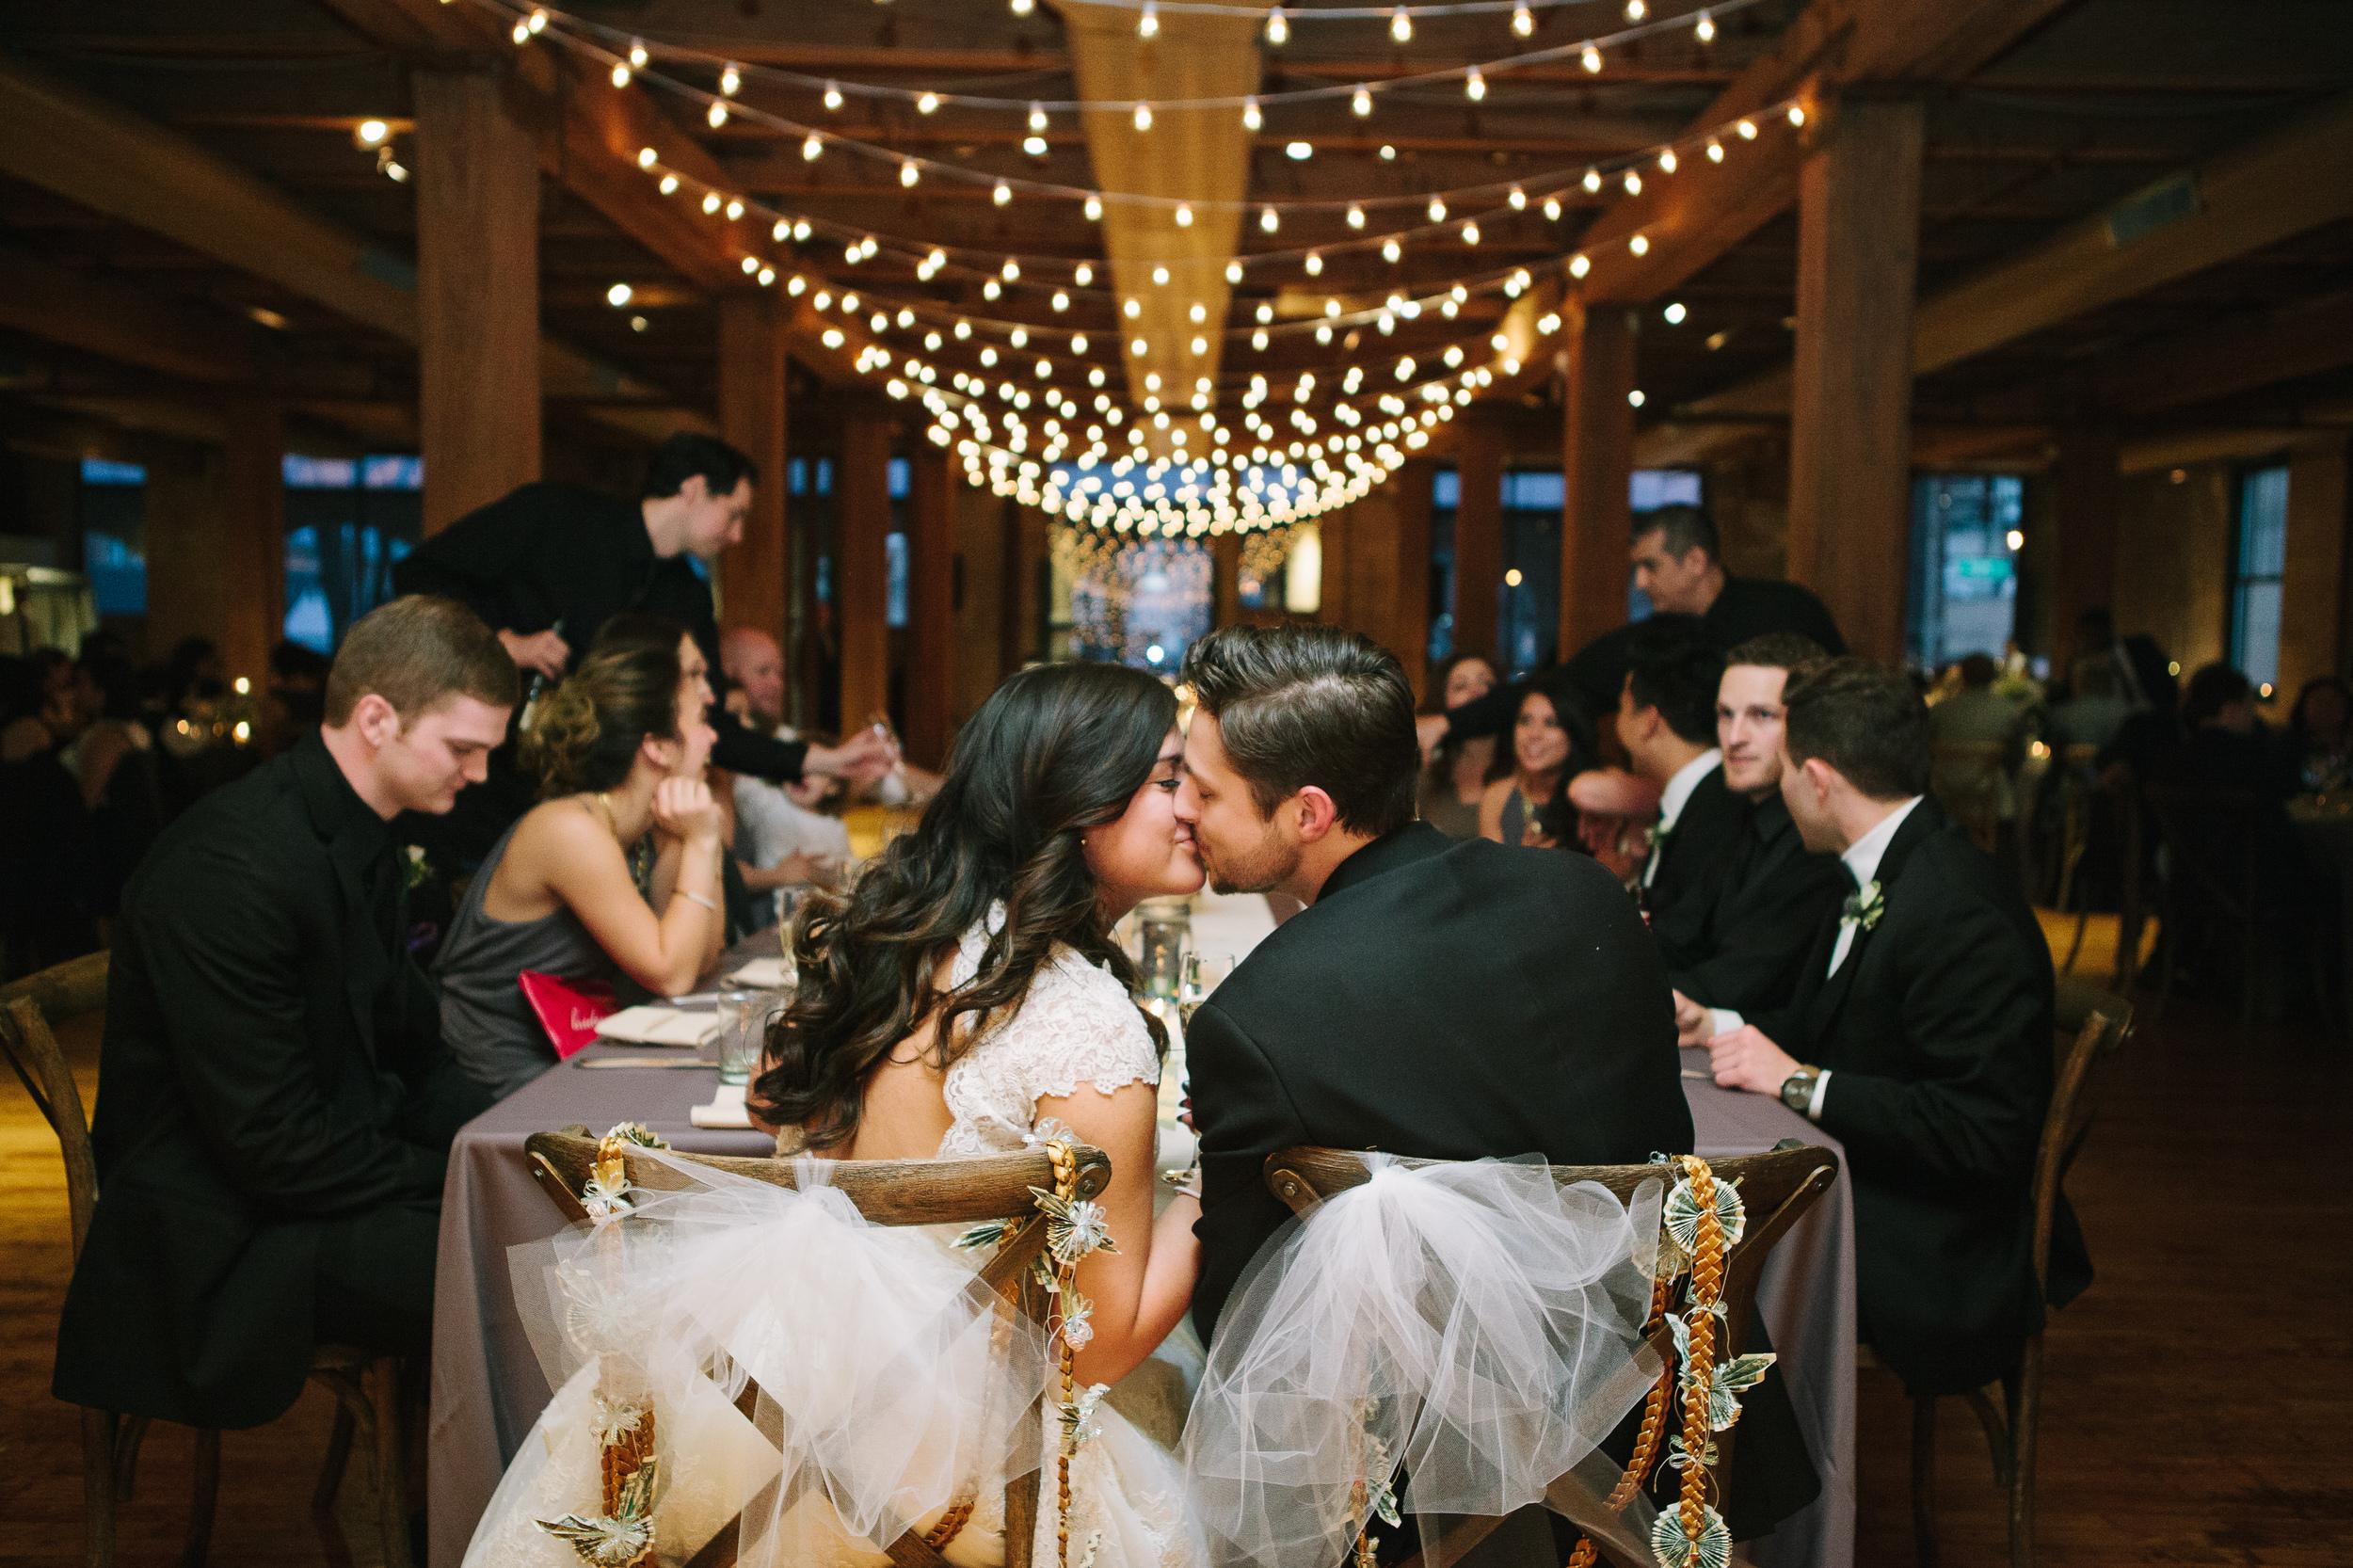 Nicodem Creative_Kerr Wedding_Bridgeport Art Center Chicago-23.jpg